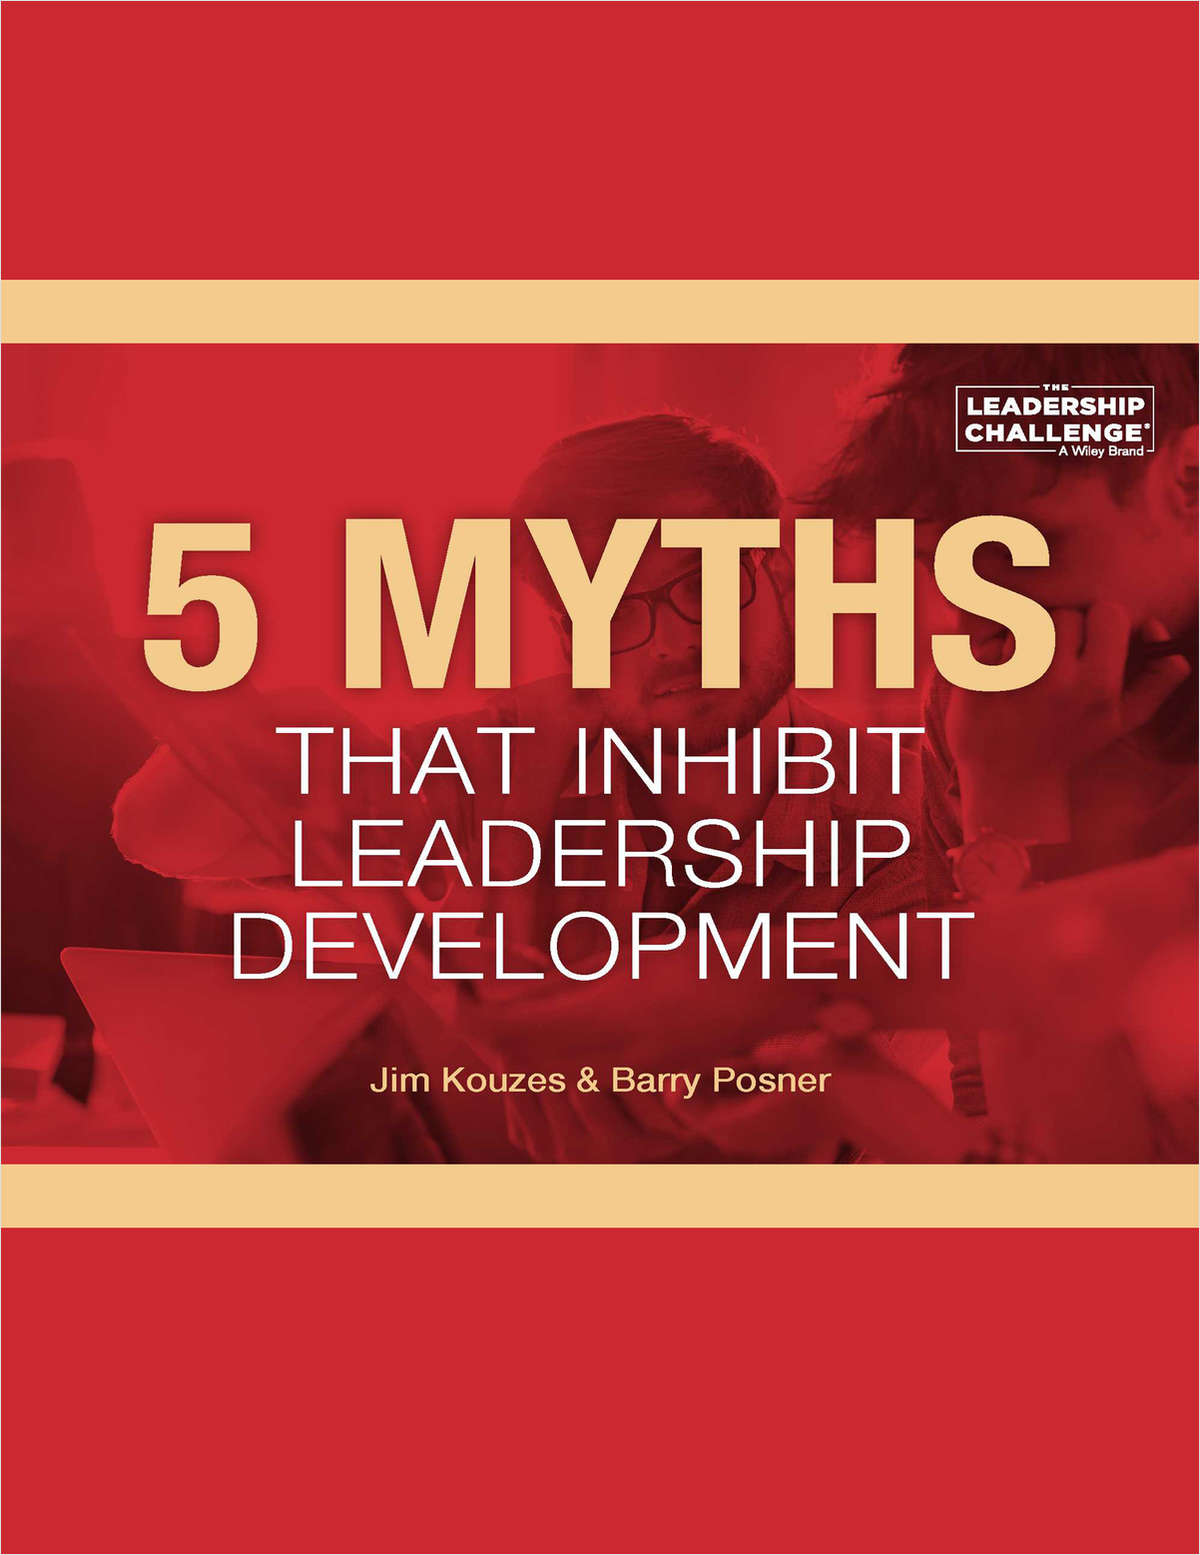 5 Myths That Inhibit Leadership Development